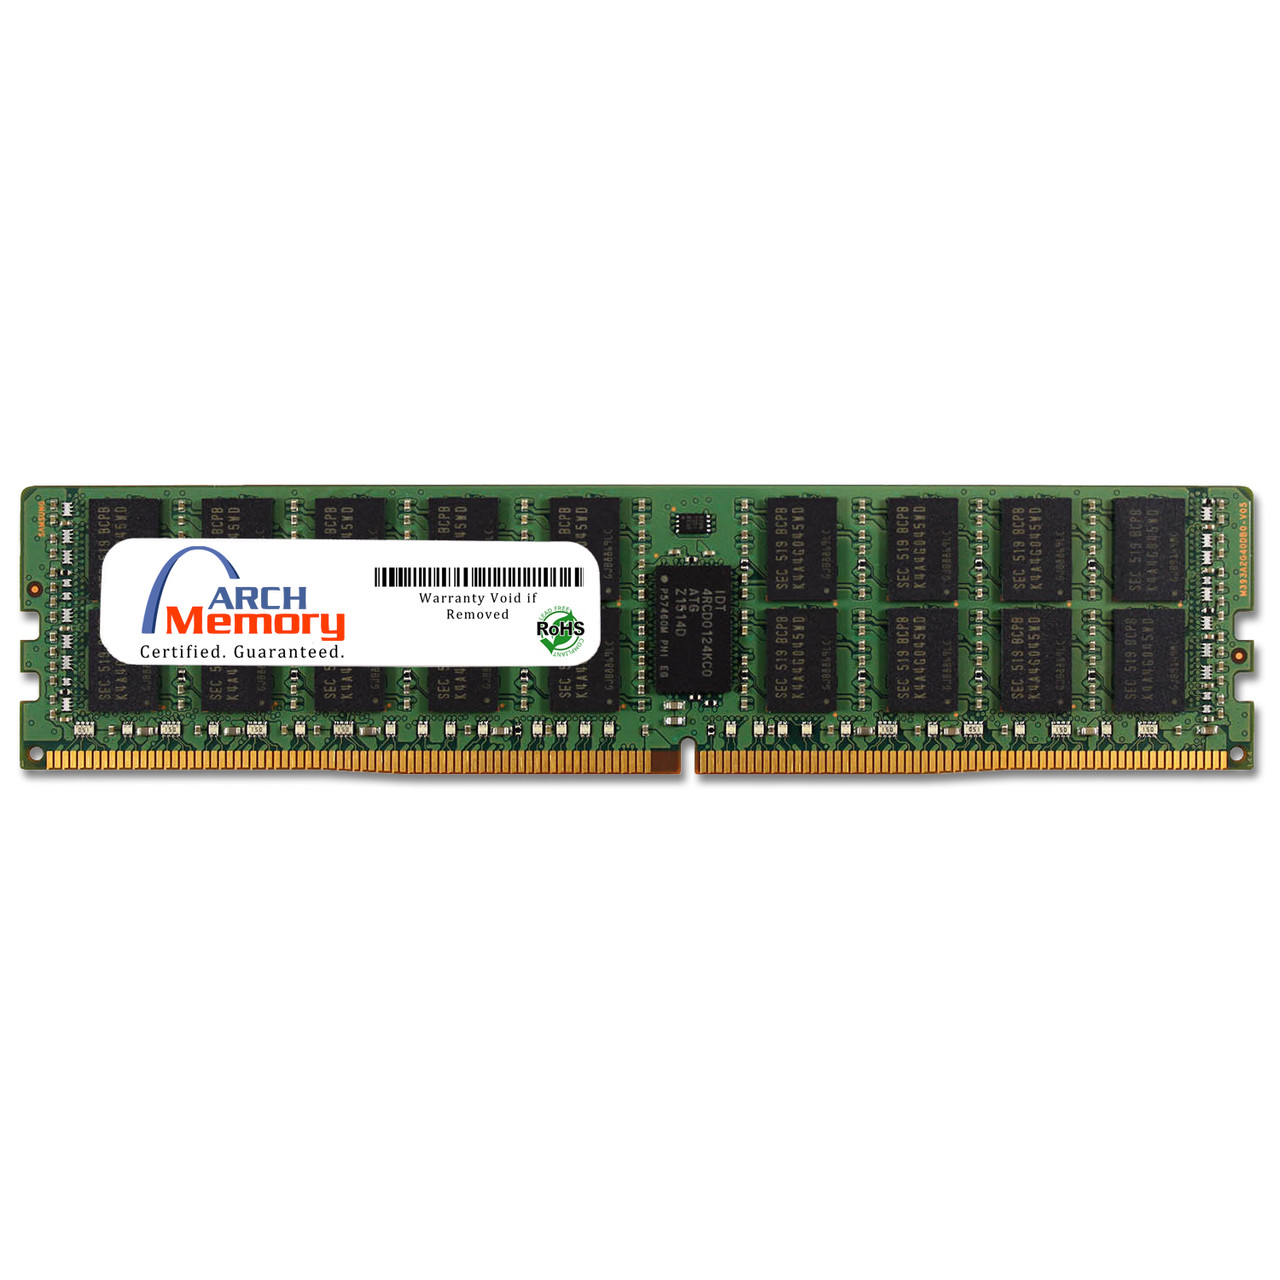 Cisco UCS-ML-X64G4RT-H 64 GB 288-Pin DDR4 2933 MHz LRDIMM RAM